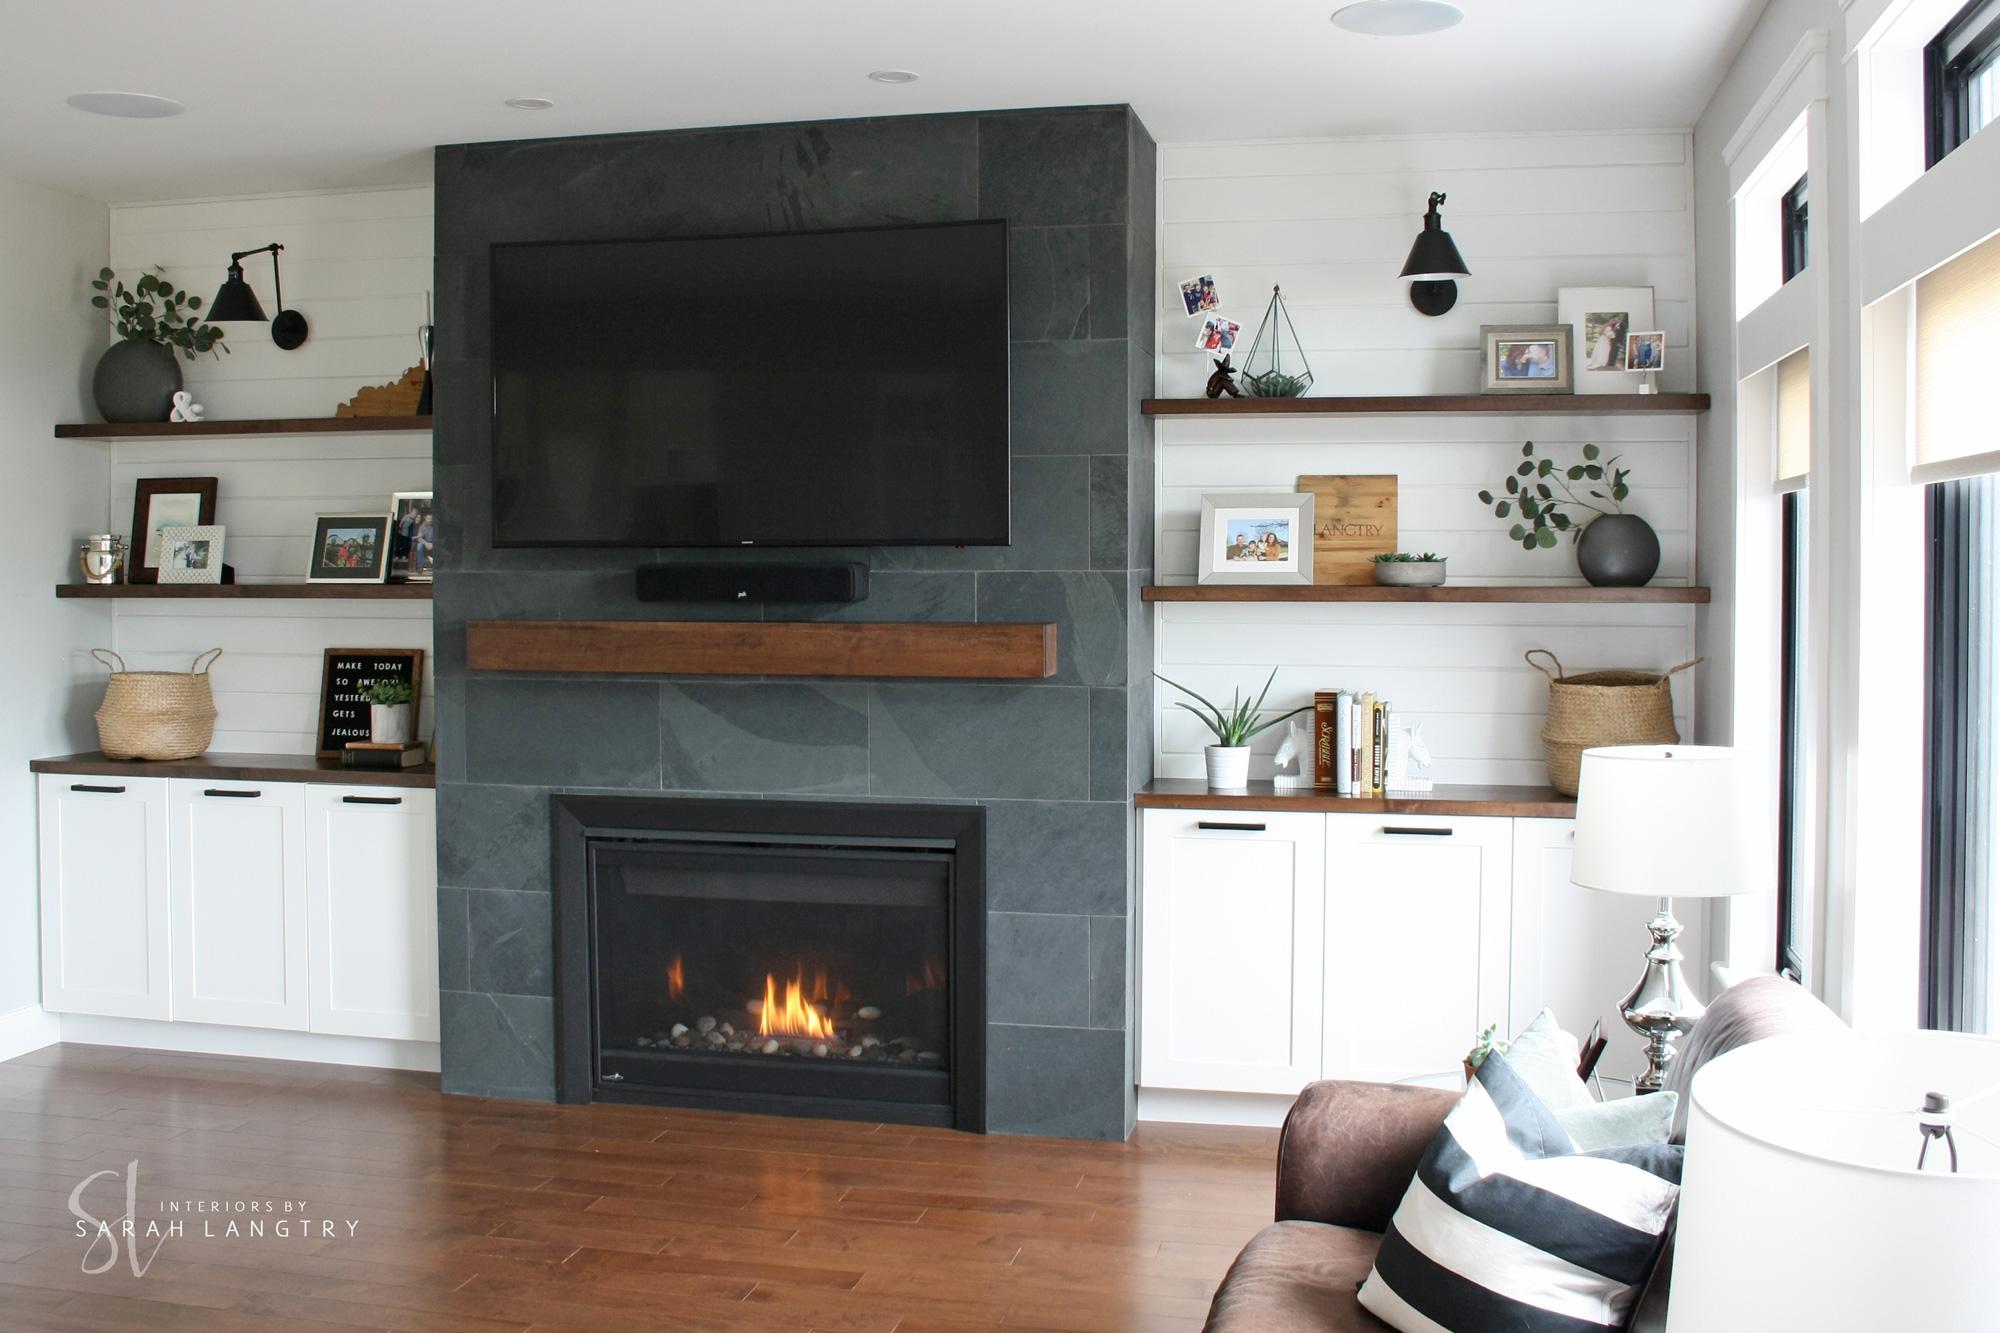 interior-design-custom-builtins-fireplace-slate-goderich-ontario.jpg